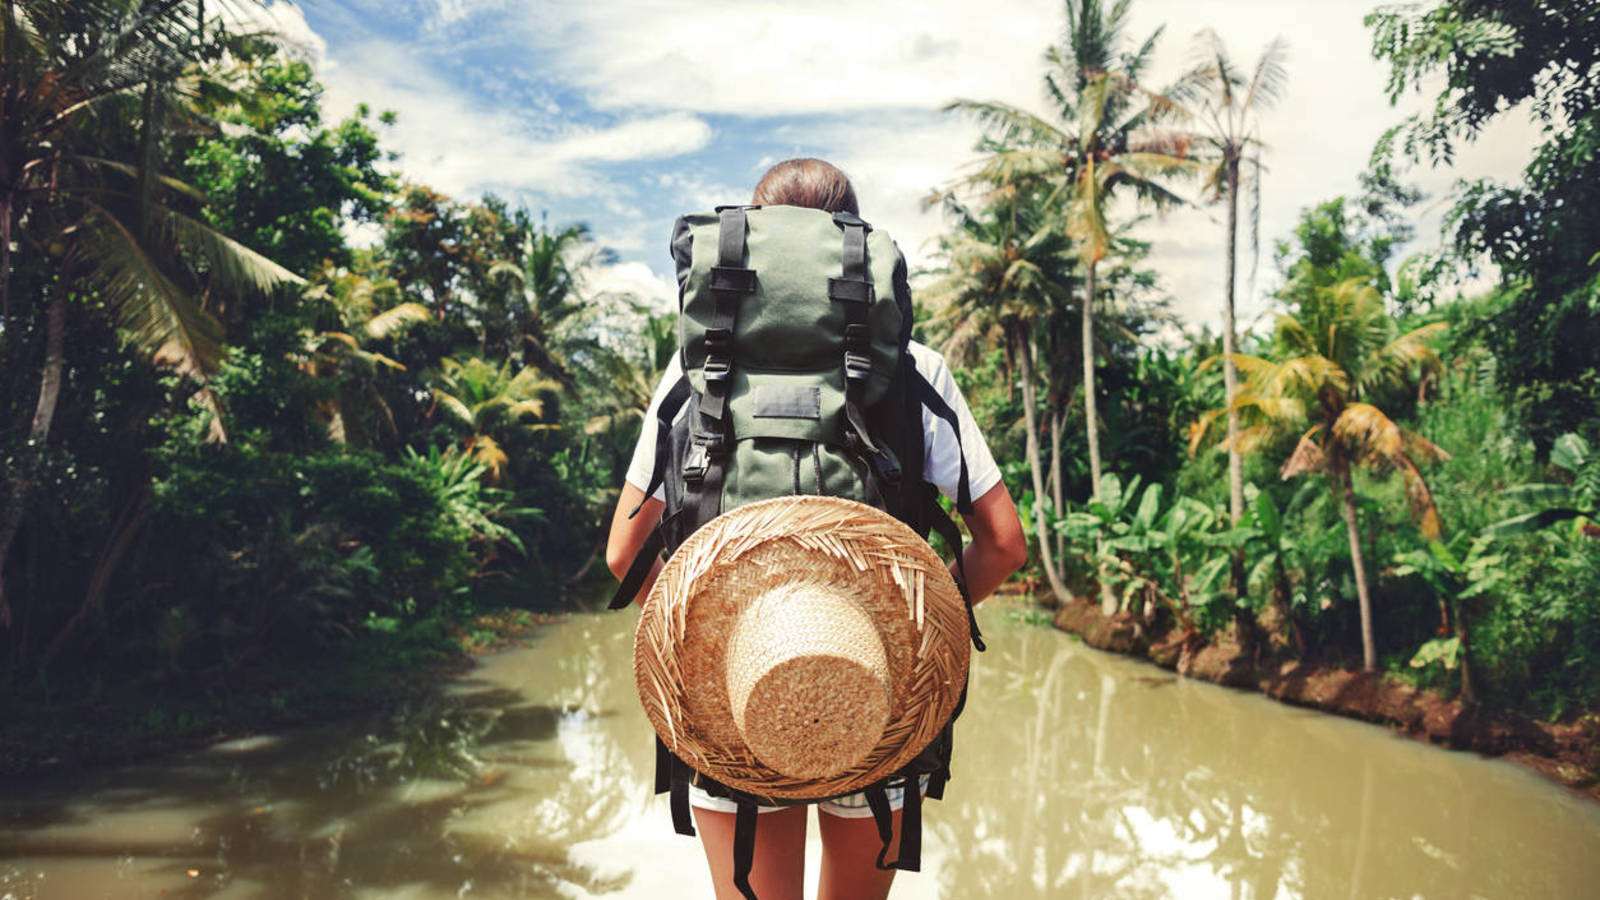 Diarrea del viajero, Mediquo. Salud. Travel.